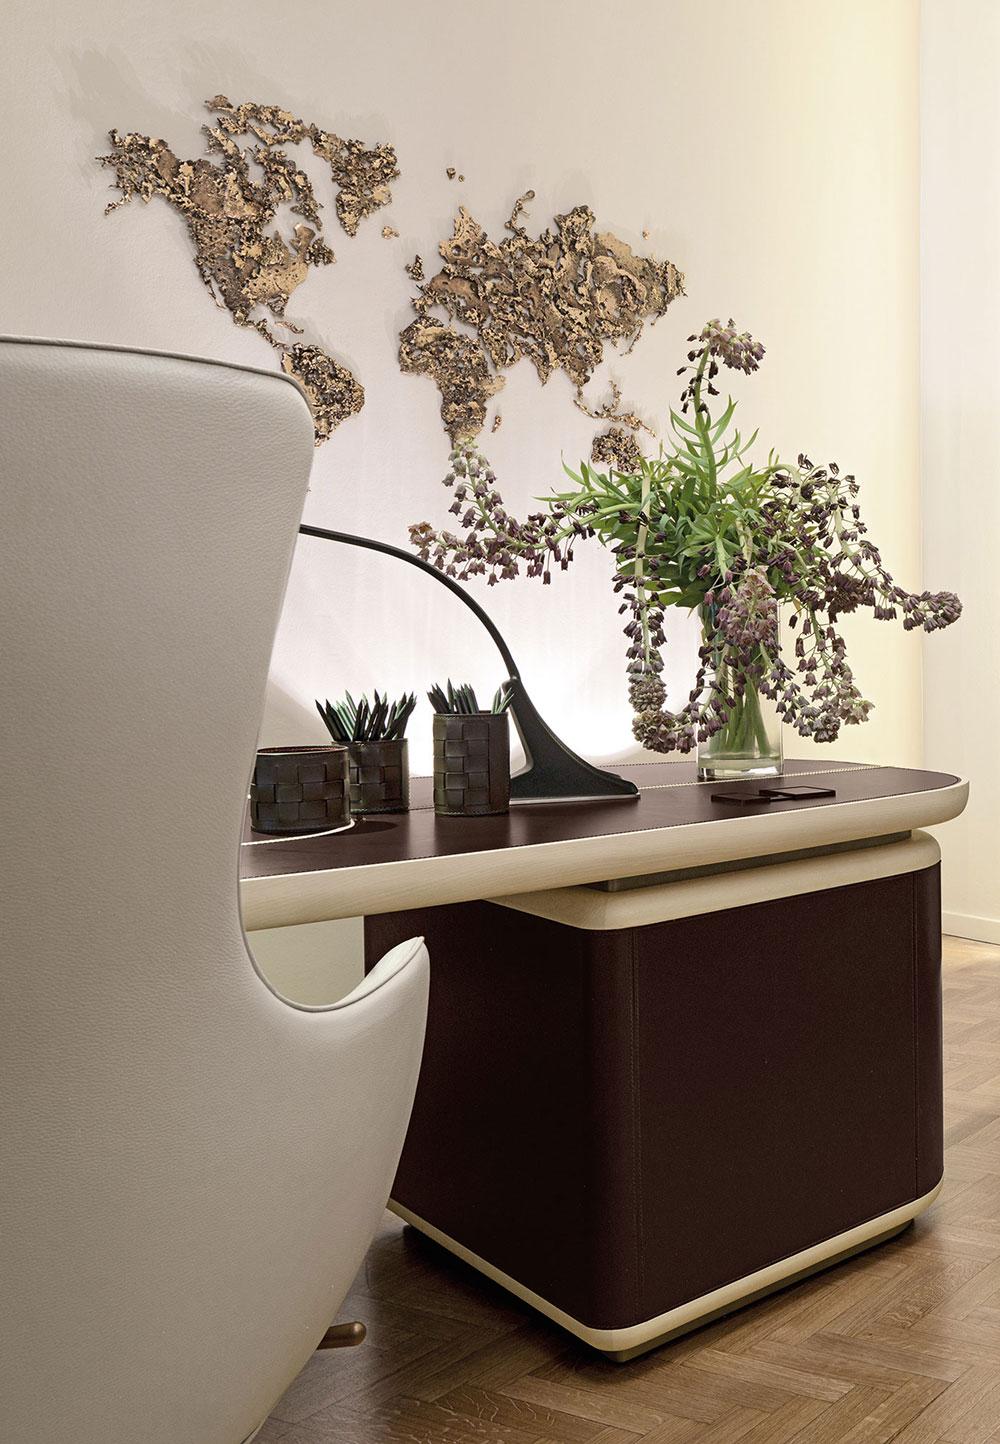 Obegi Home Working Space Giorgetti 10